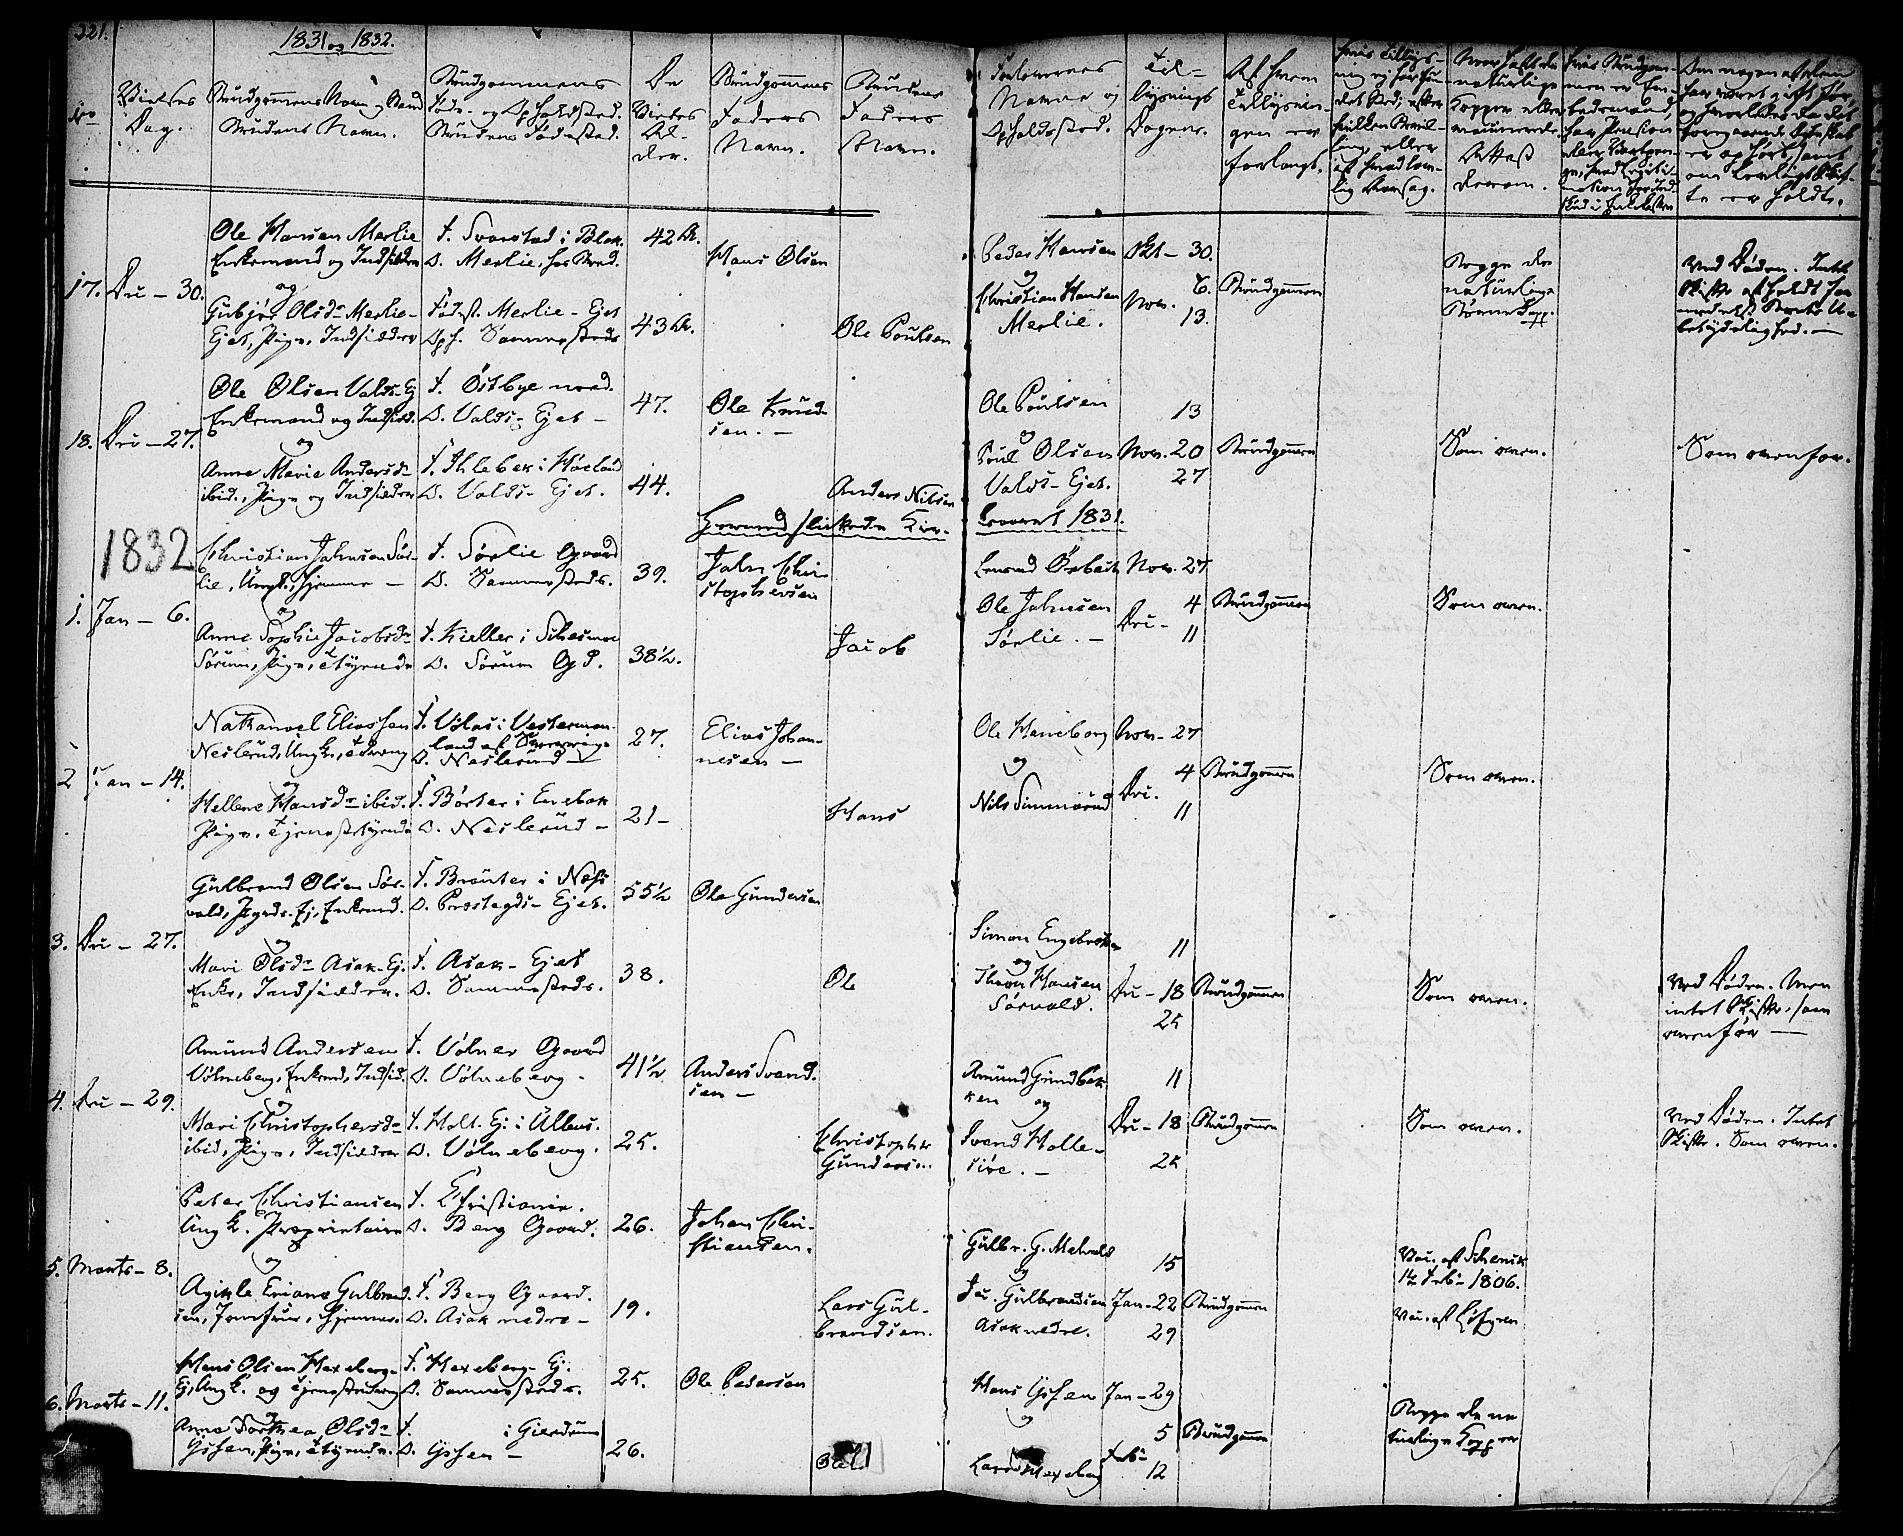 SAO, Sørum prestekontor Kirkebøker, F/Fa/L0004: Ministerialbok nr. I 4, 1829-1845, s. 221